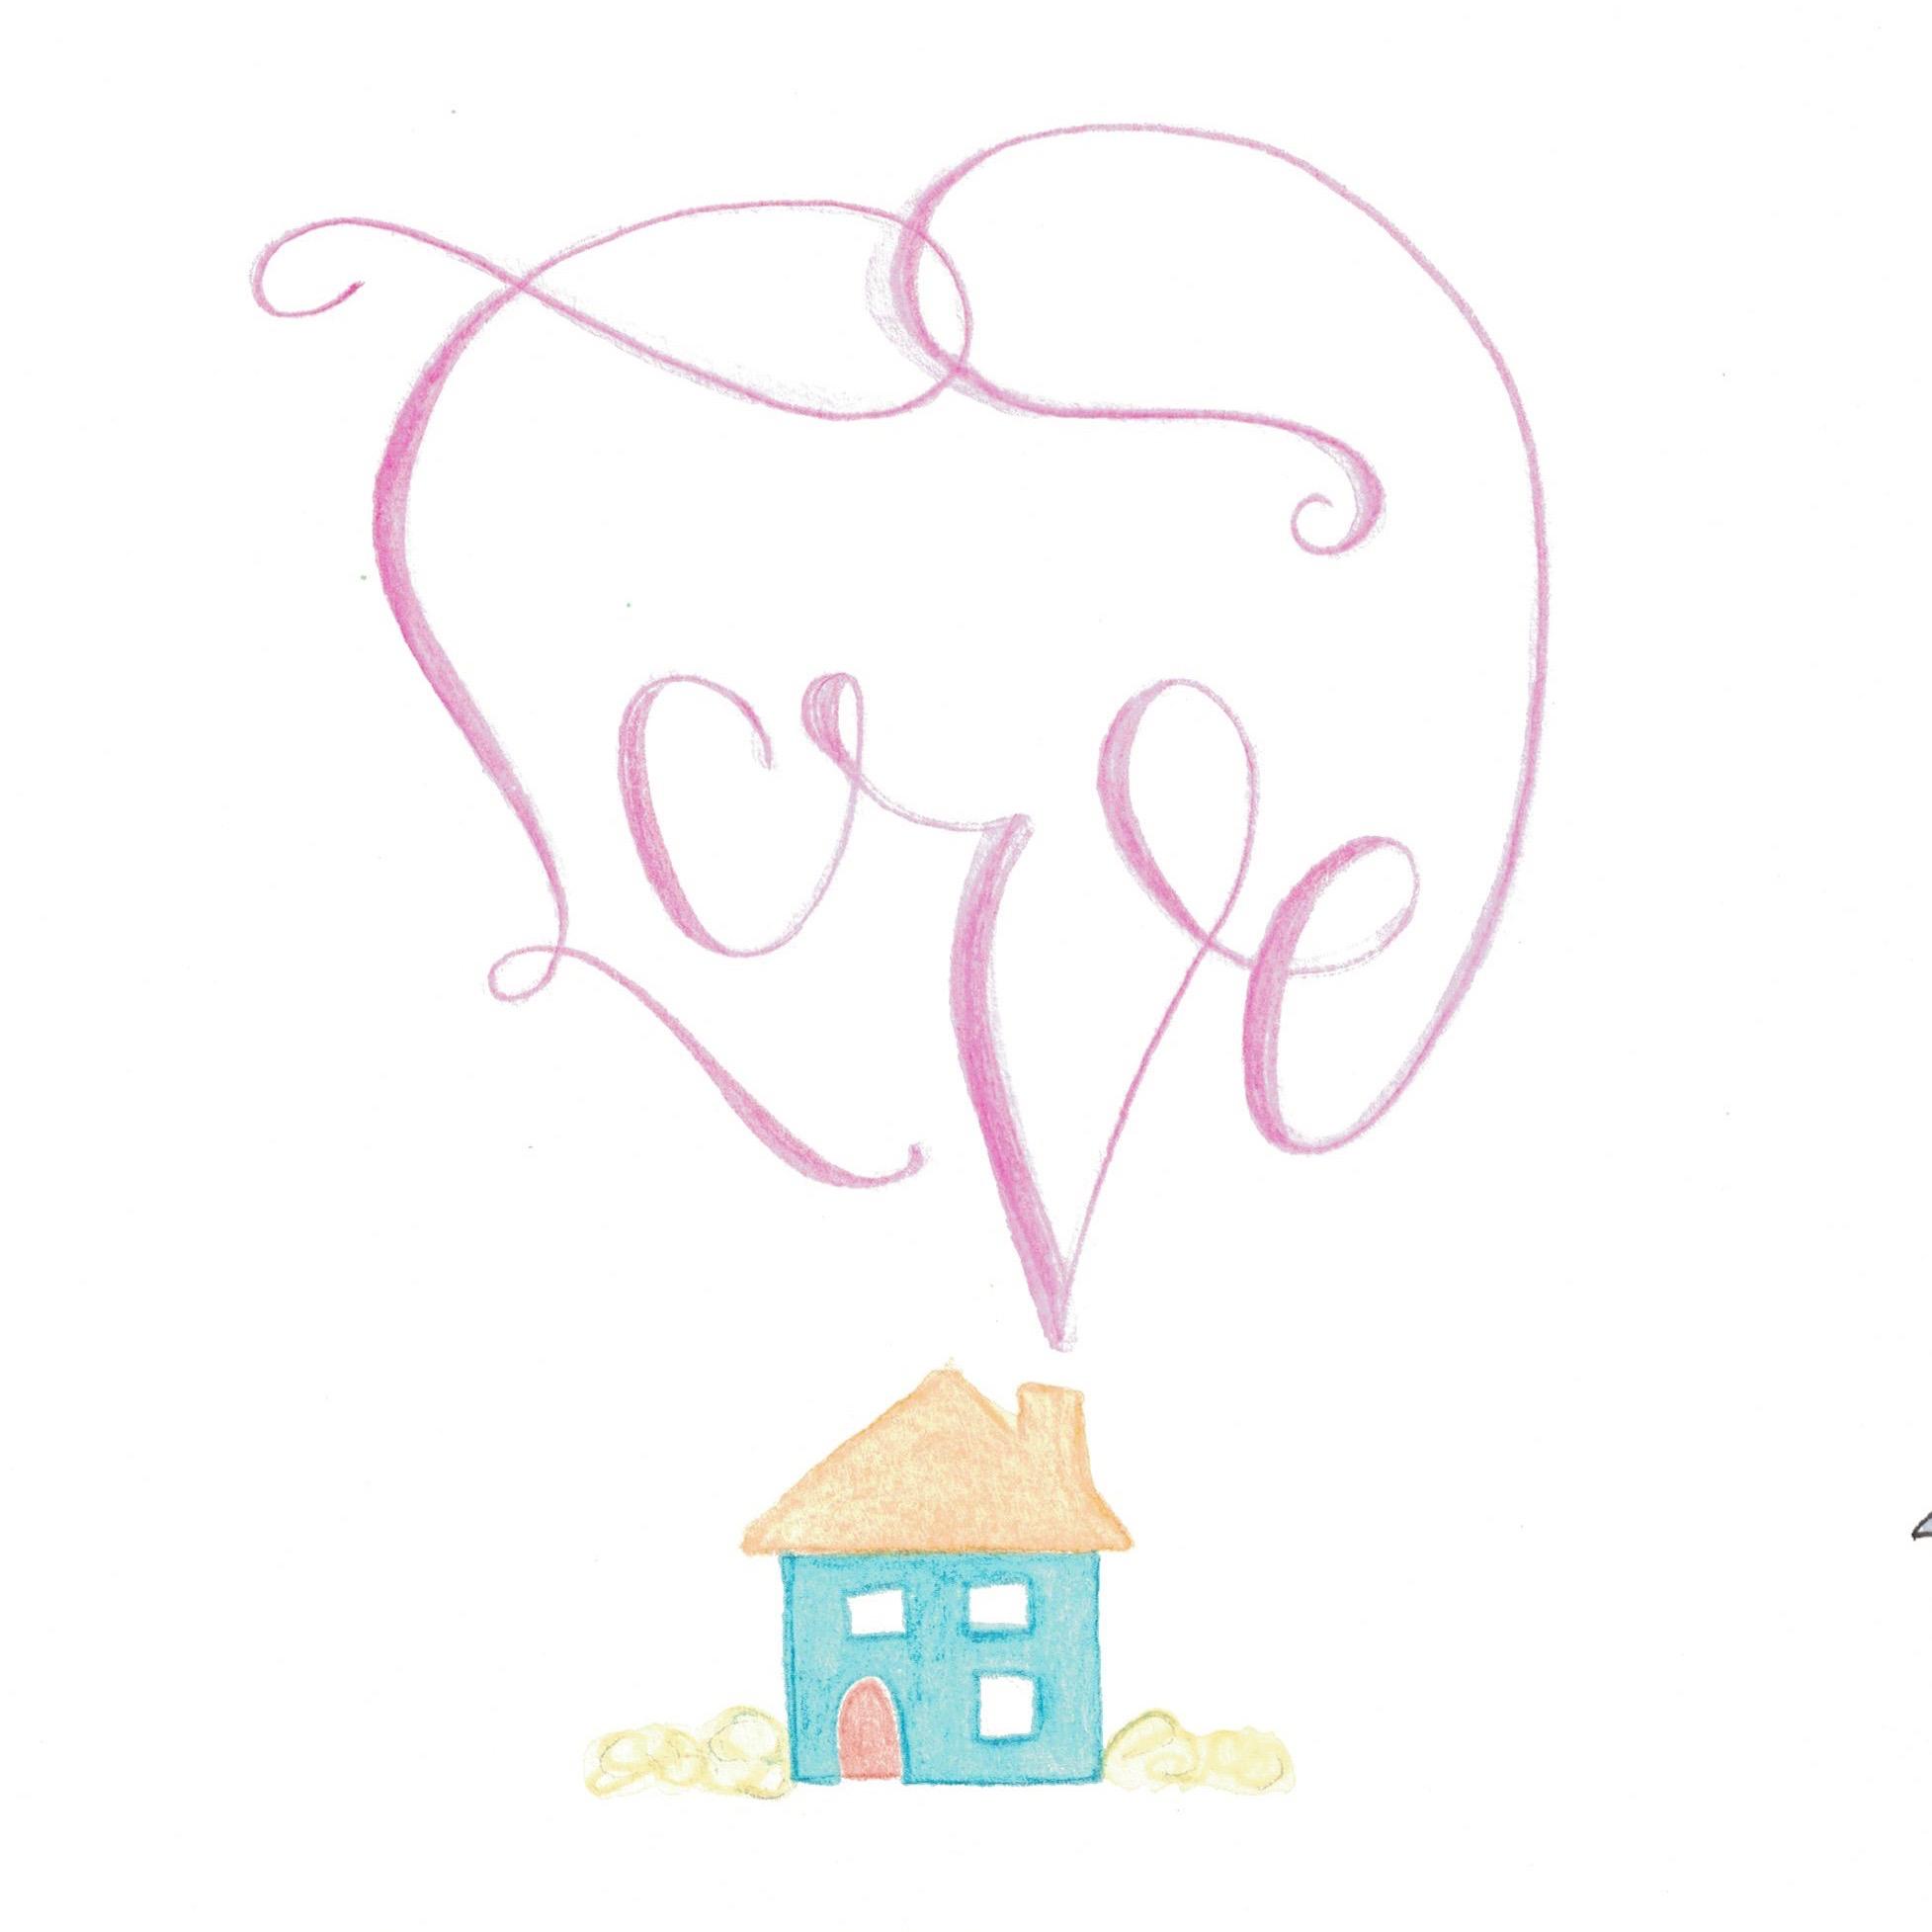 House of love.jpeg